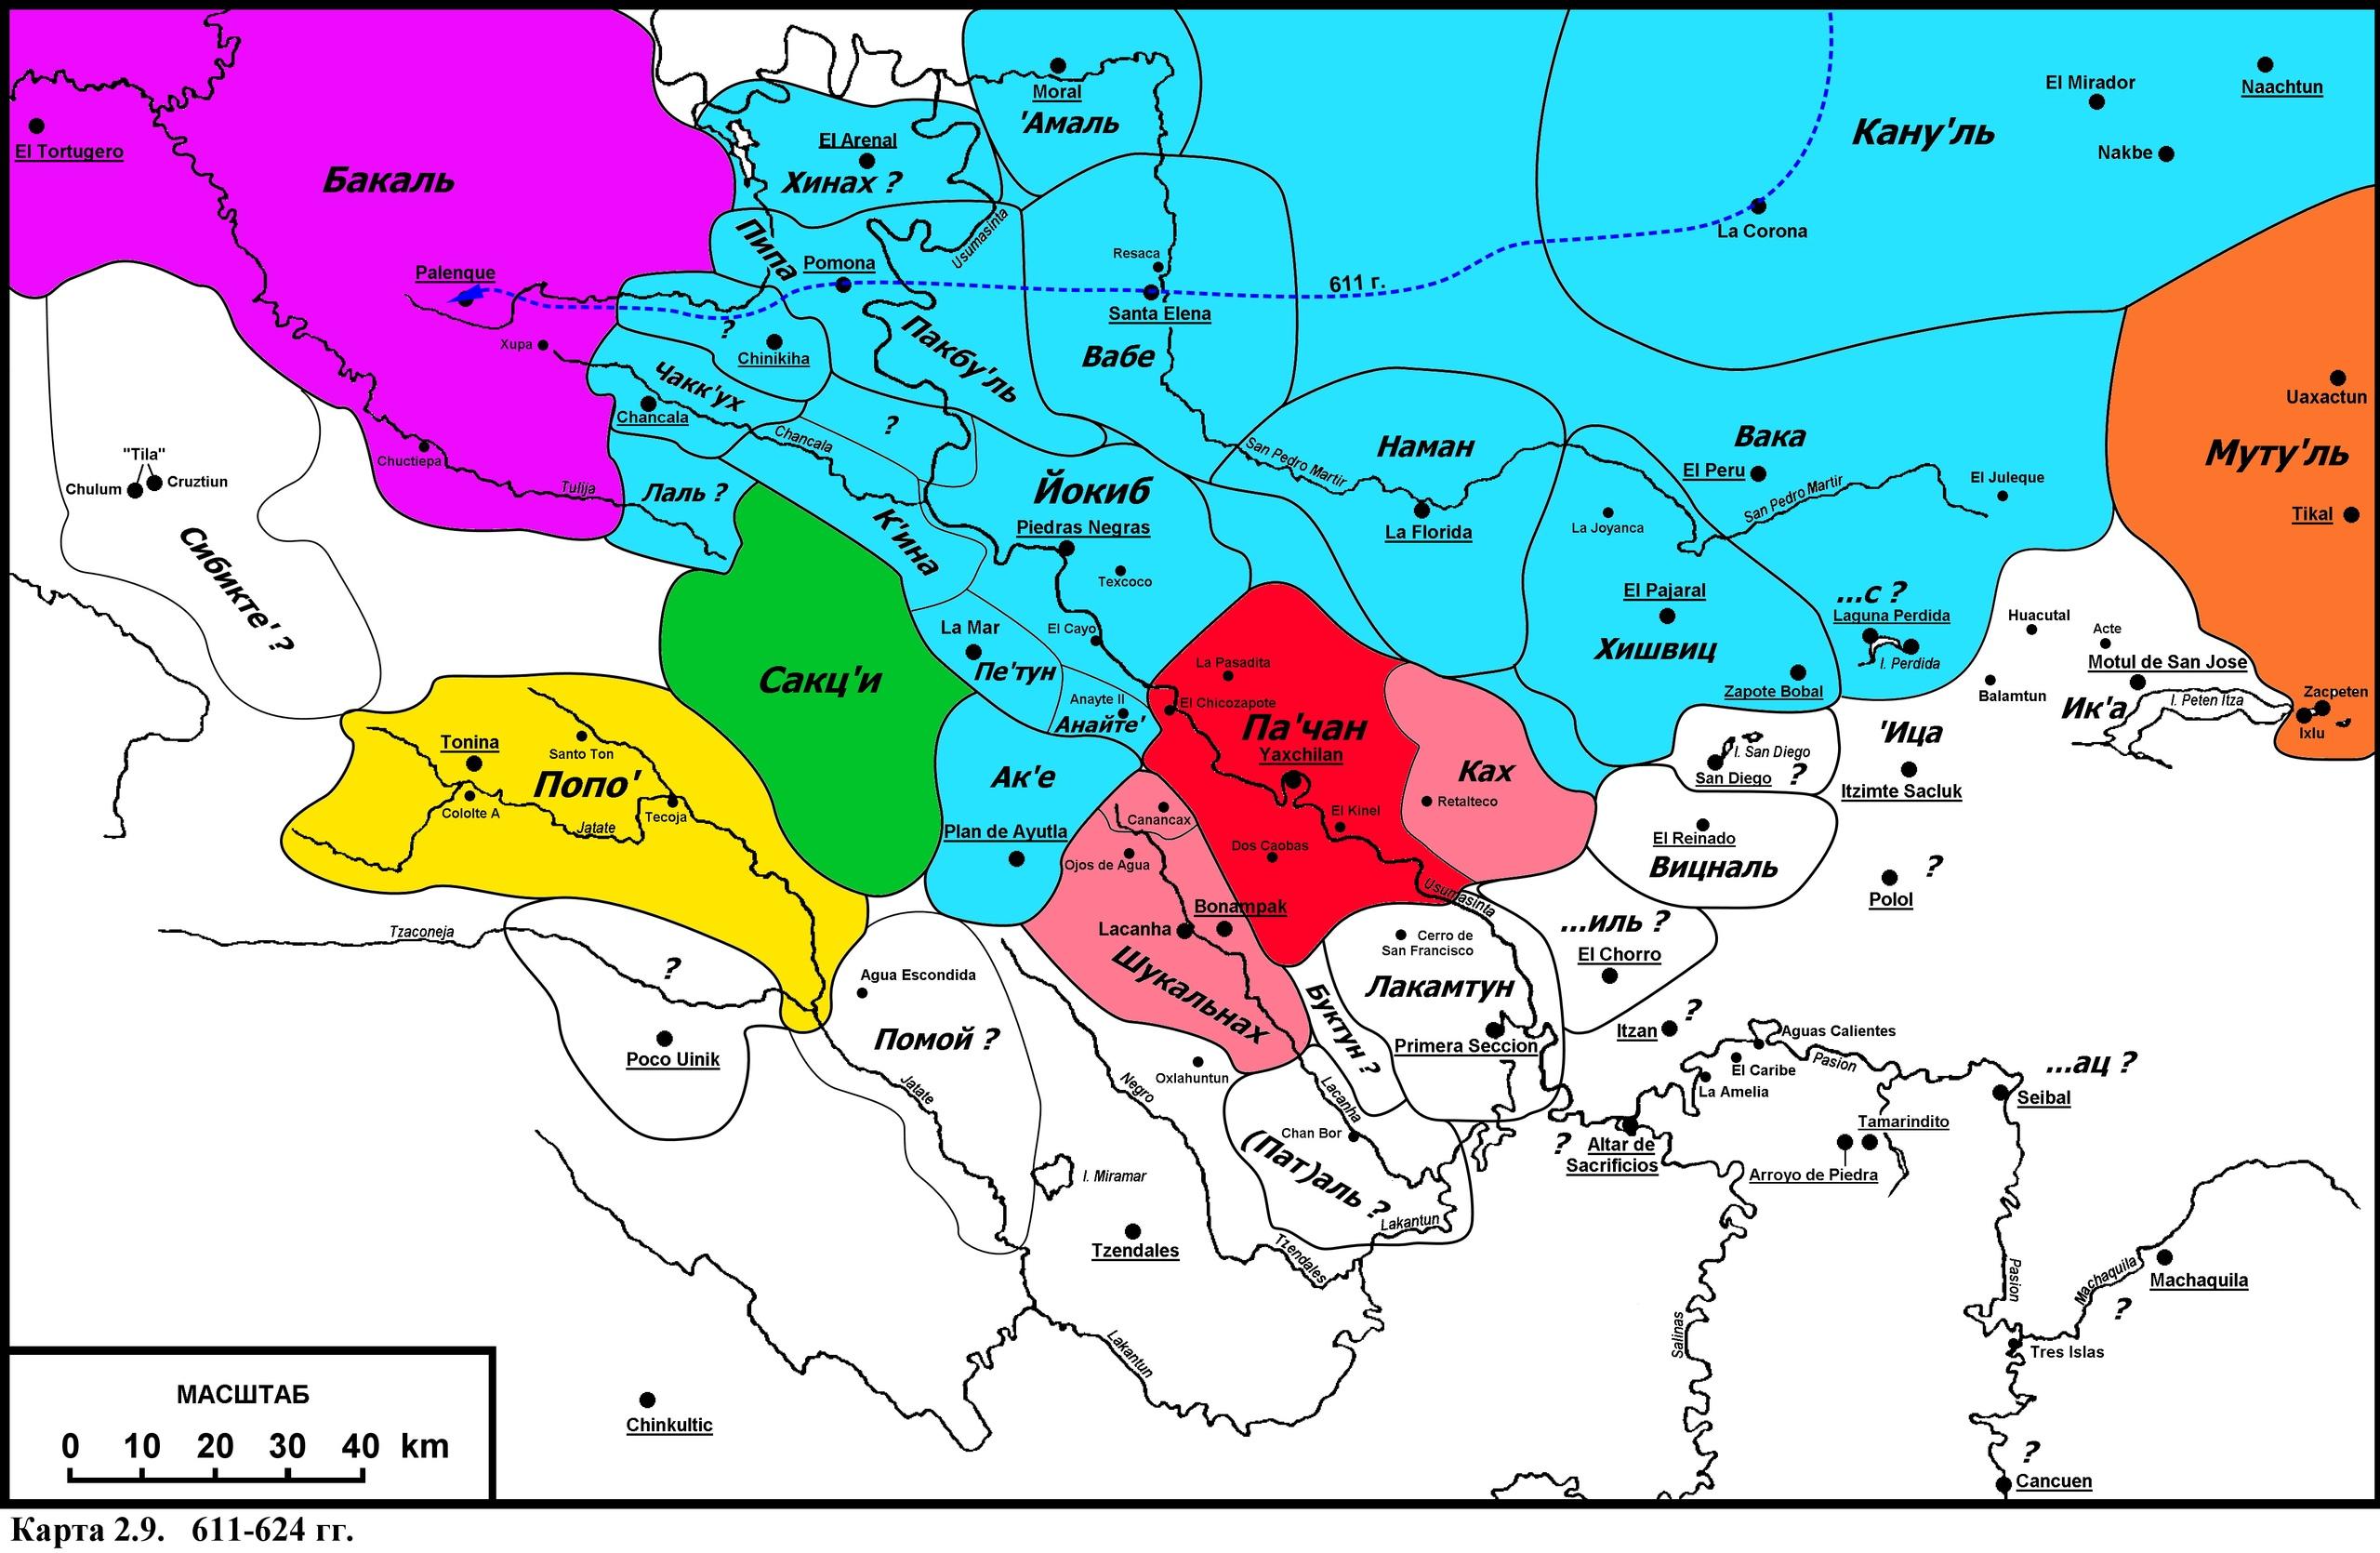 Поход Кану'ля против Бакаля в 611 г.